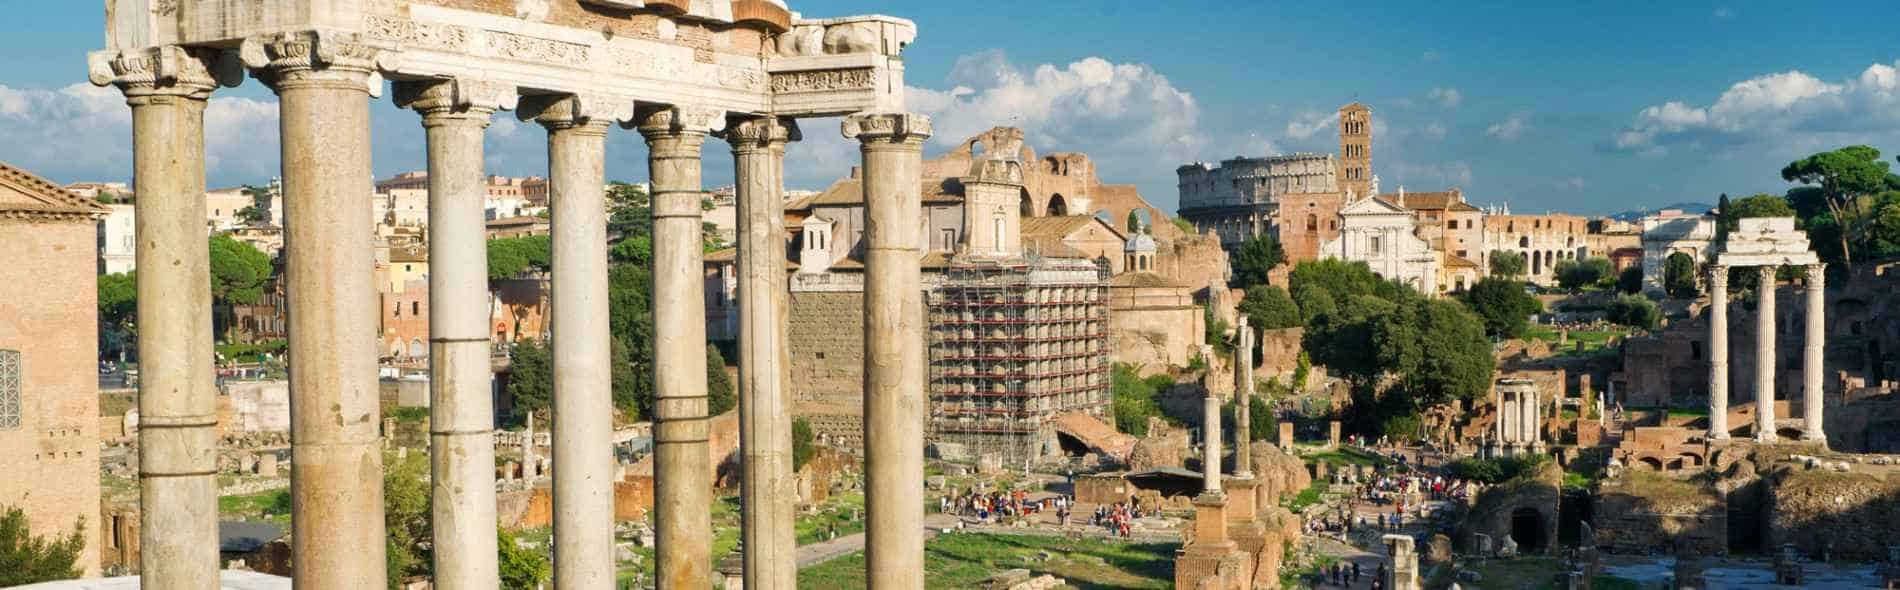 Deal 20% off Colosseum tour